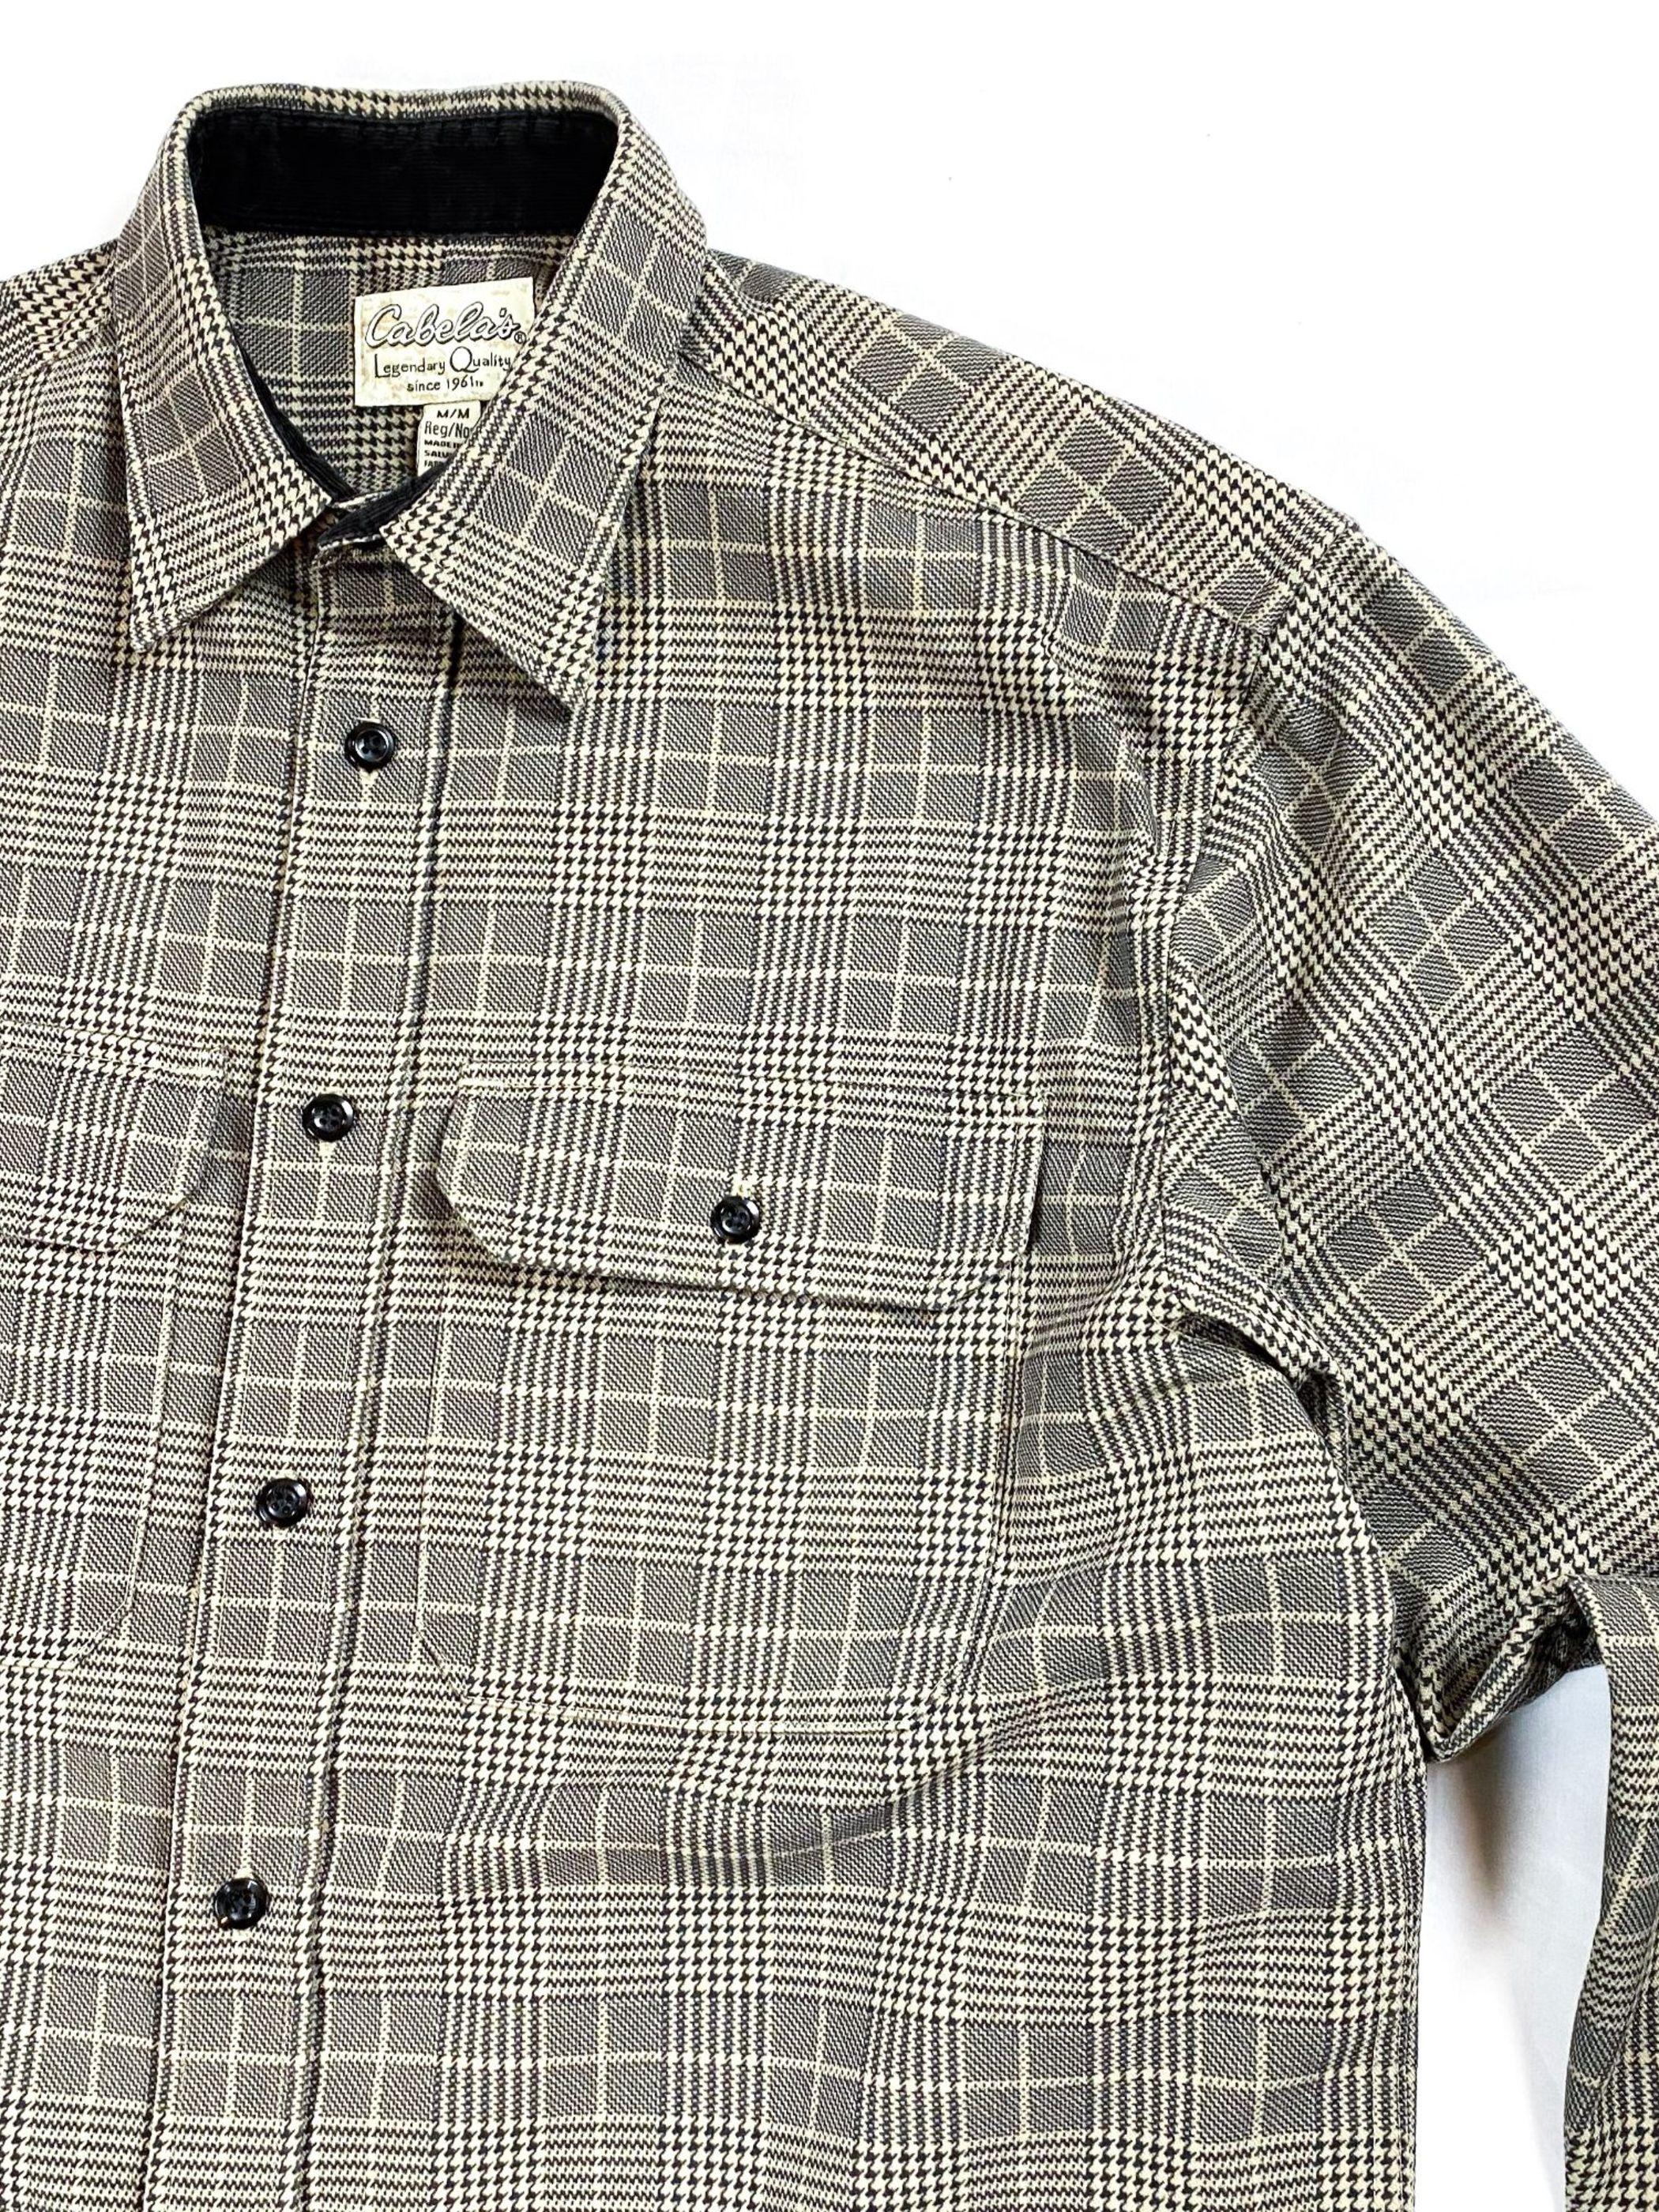 Cabela's glen check shirt